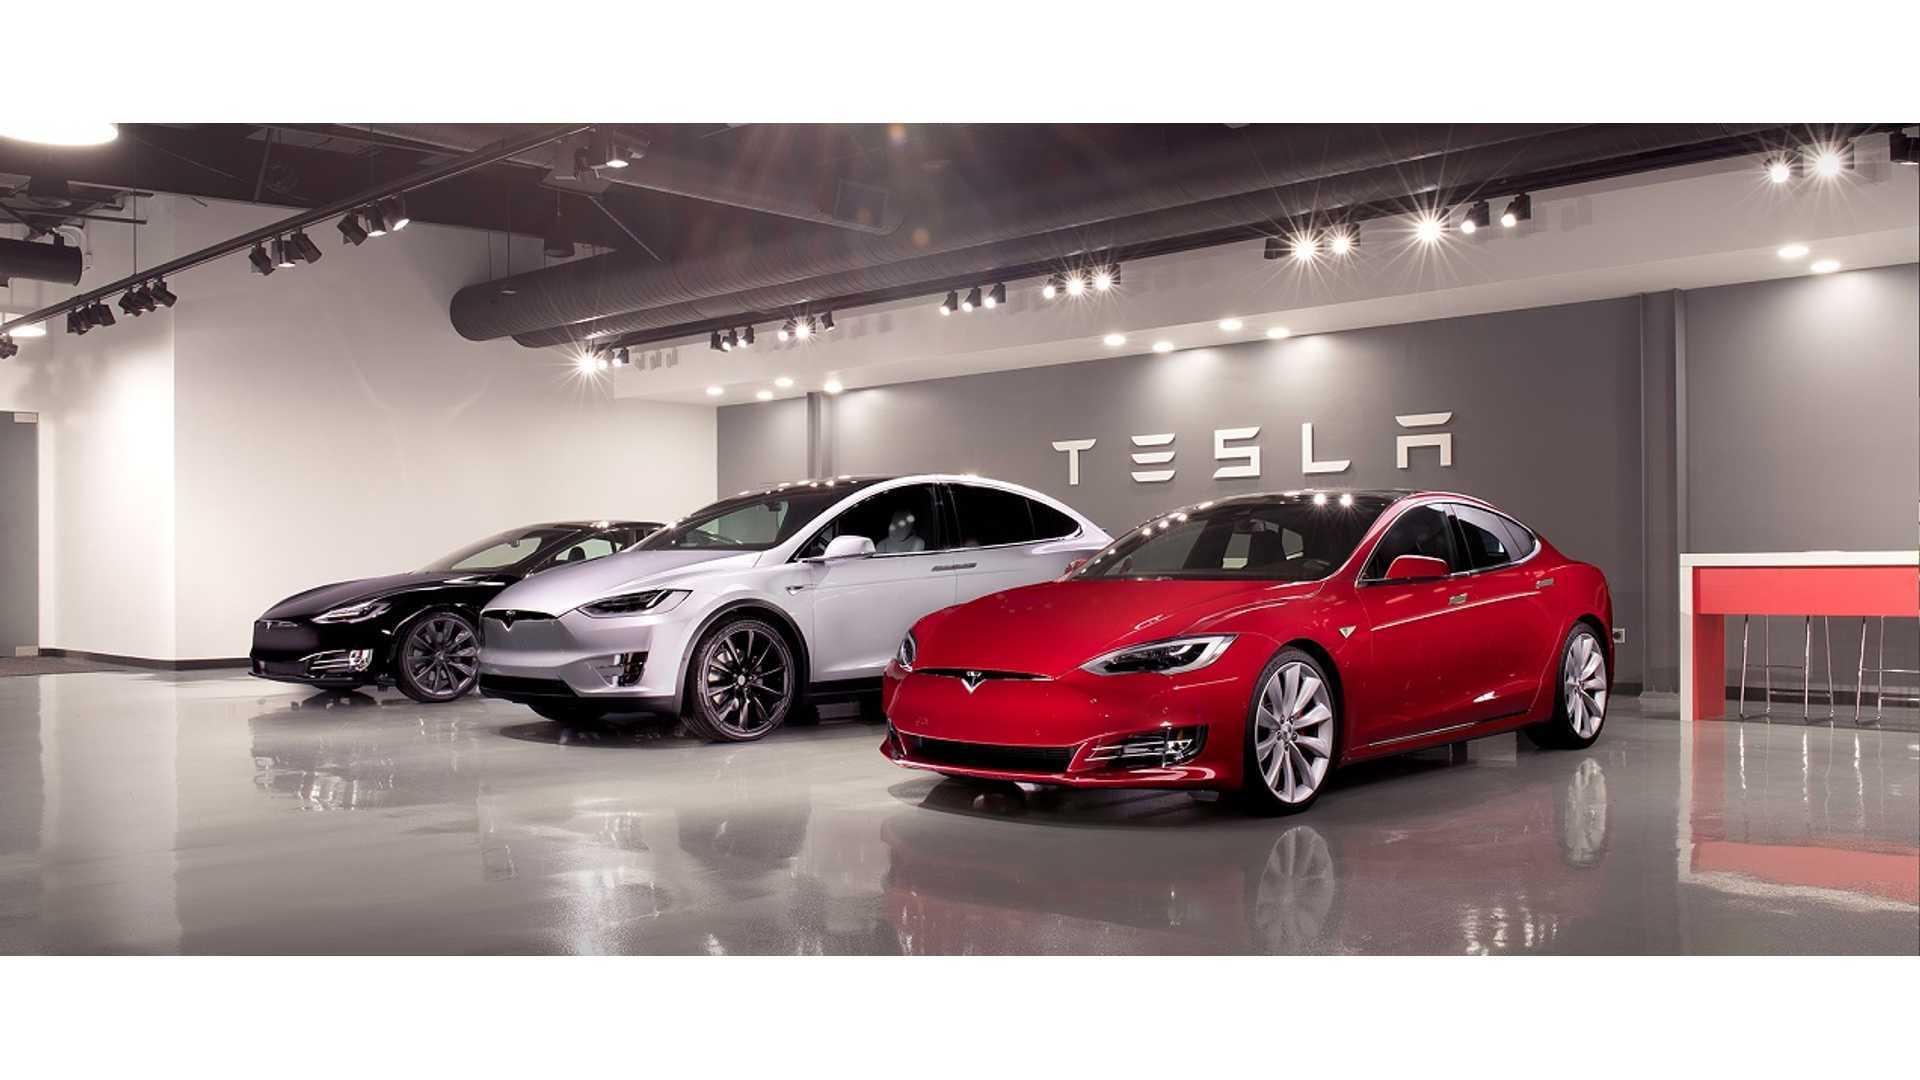 Adversaries Ramp Up Efforts To Reverse The Rise Of Tesla & Elon Musk